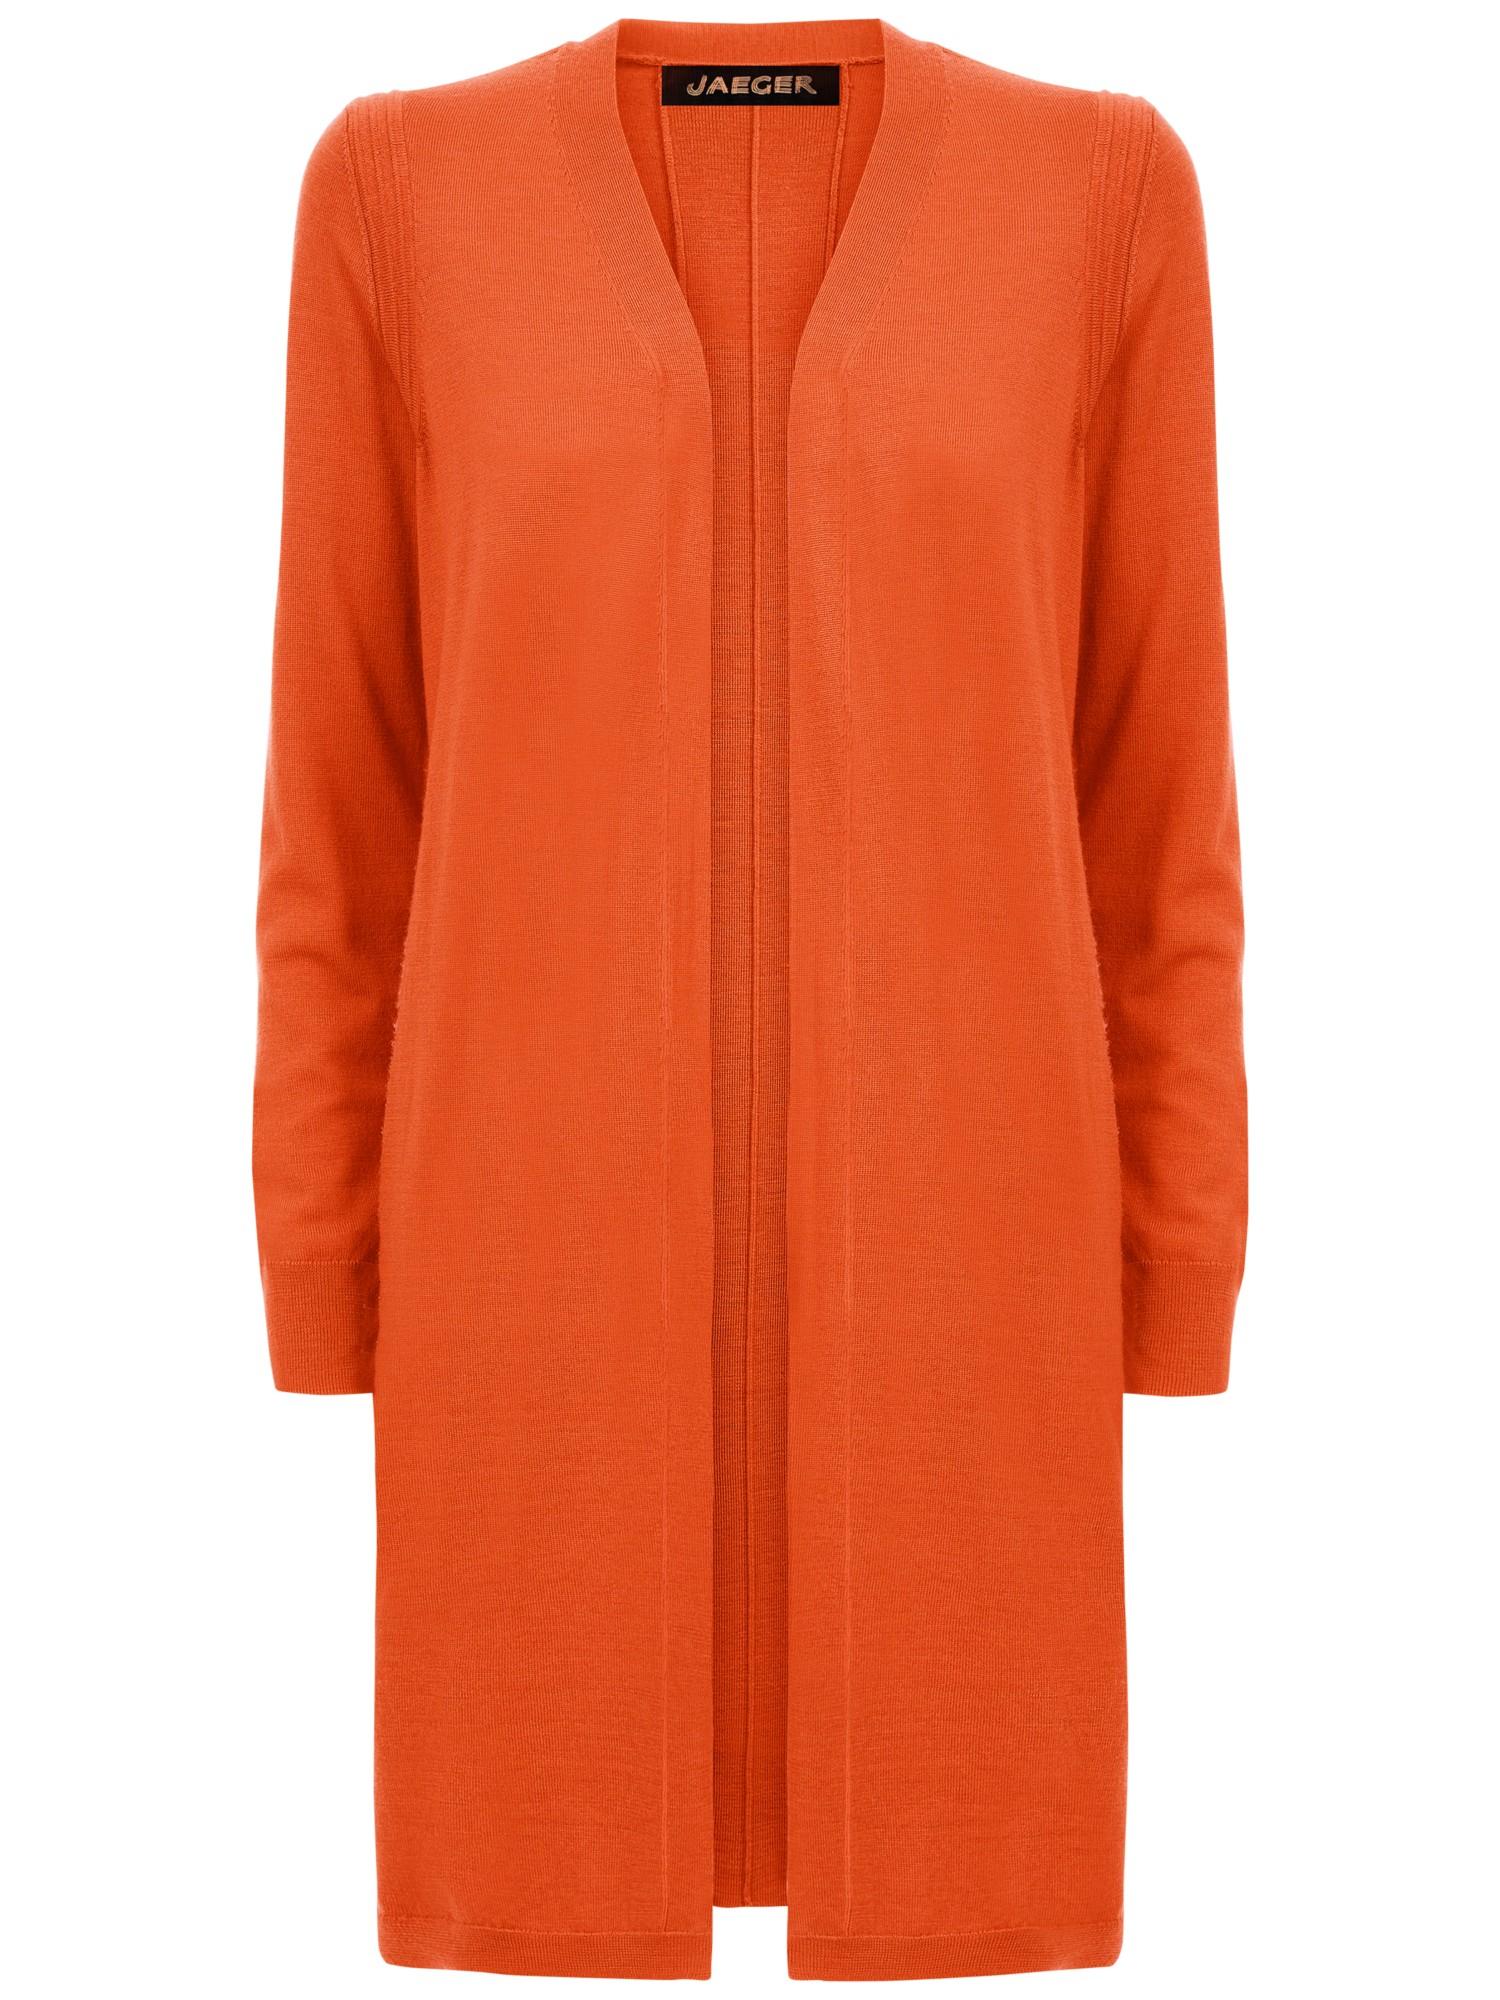 Jaeger Gostwyck Long-Line Cardigan in Orange